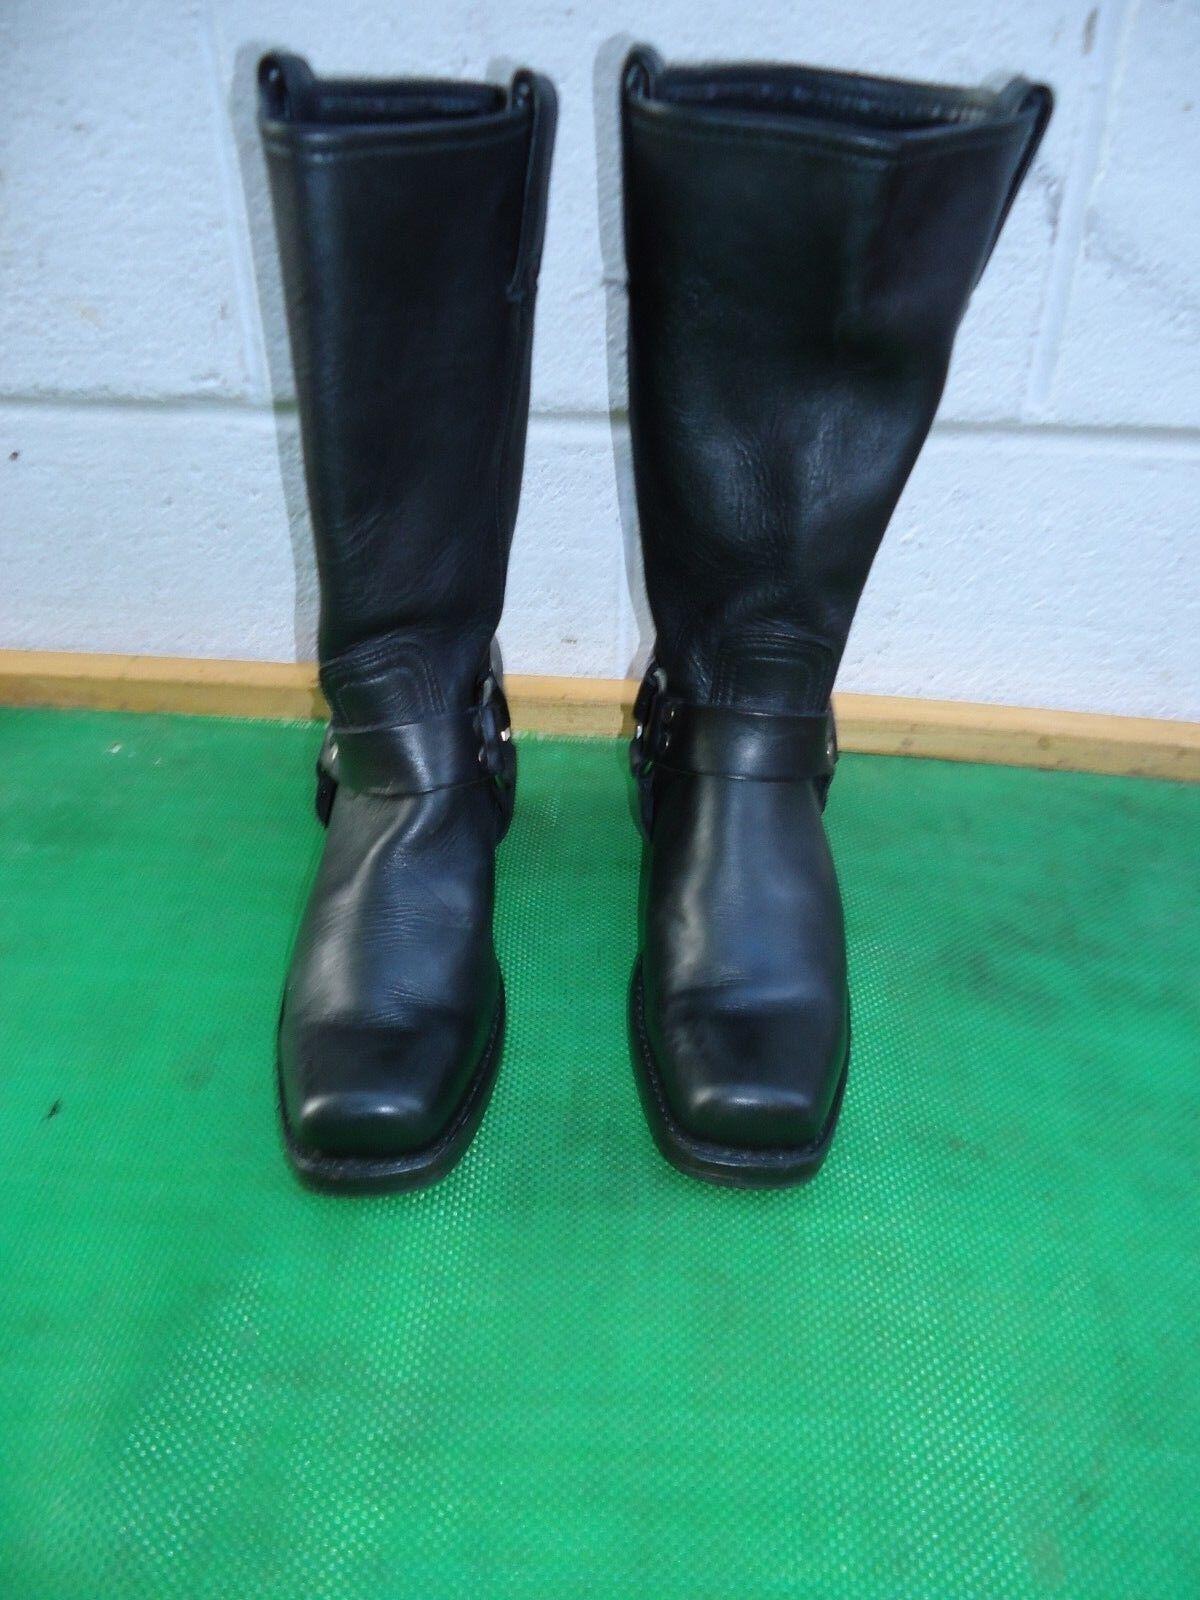 FRYE FRYE FRYE Harness  77300 Black Leather Riding Biking Motorcycle Boot Women SZ 8 M 04781d